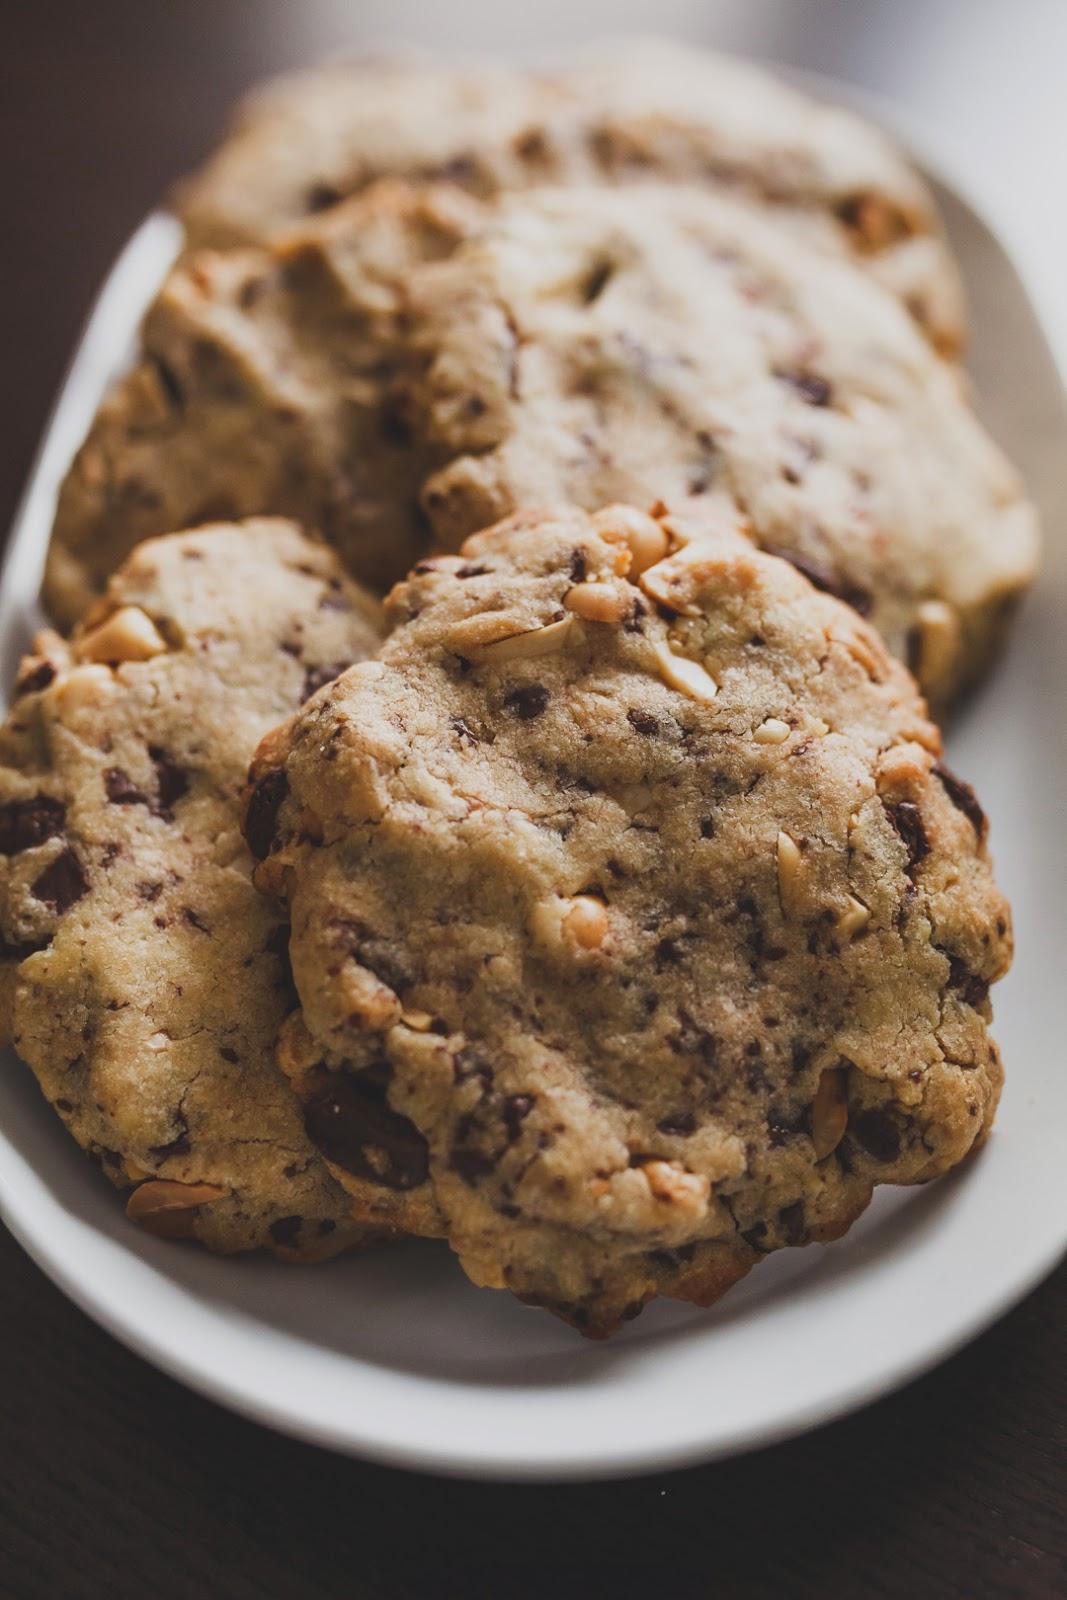 backen und kochen erdnuss schoko cookies. Black Bedroom Furniture Sets. Home Design Ideas